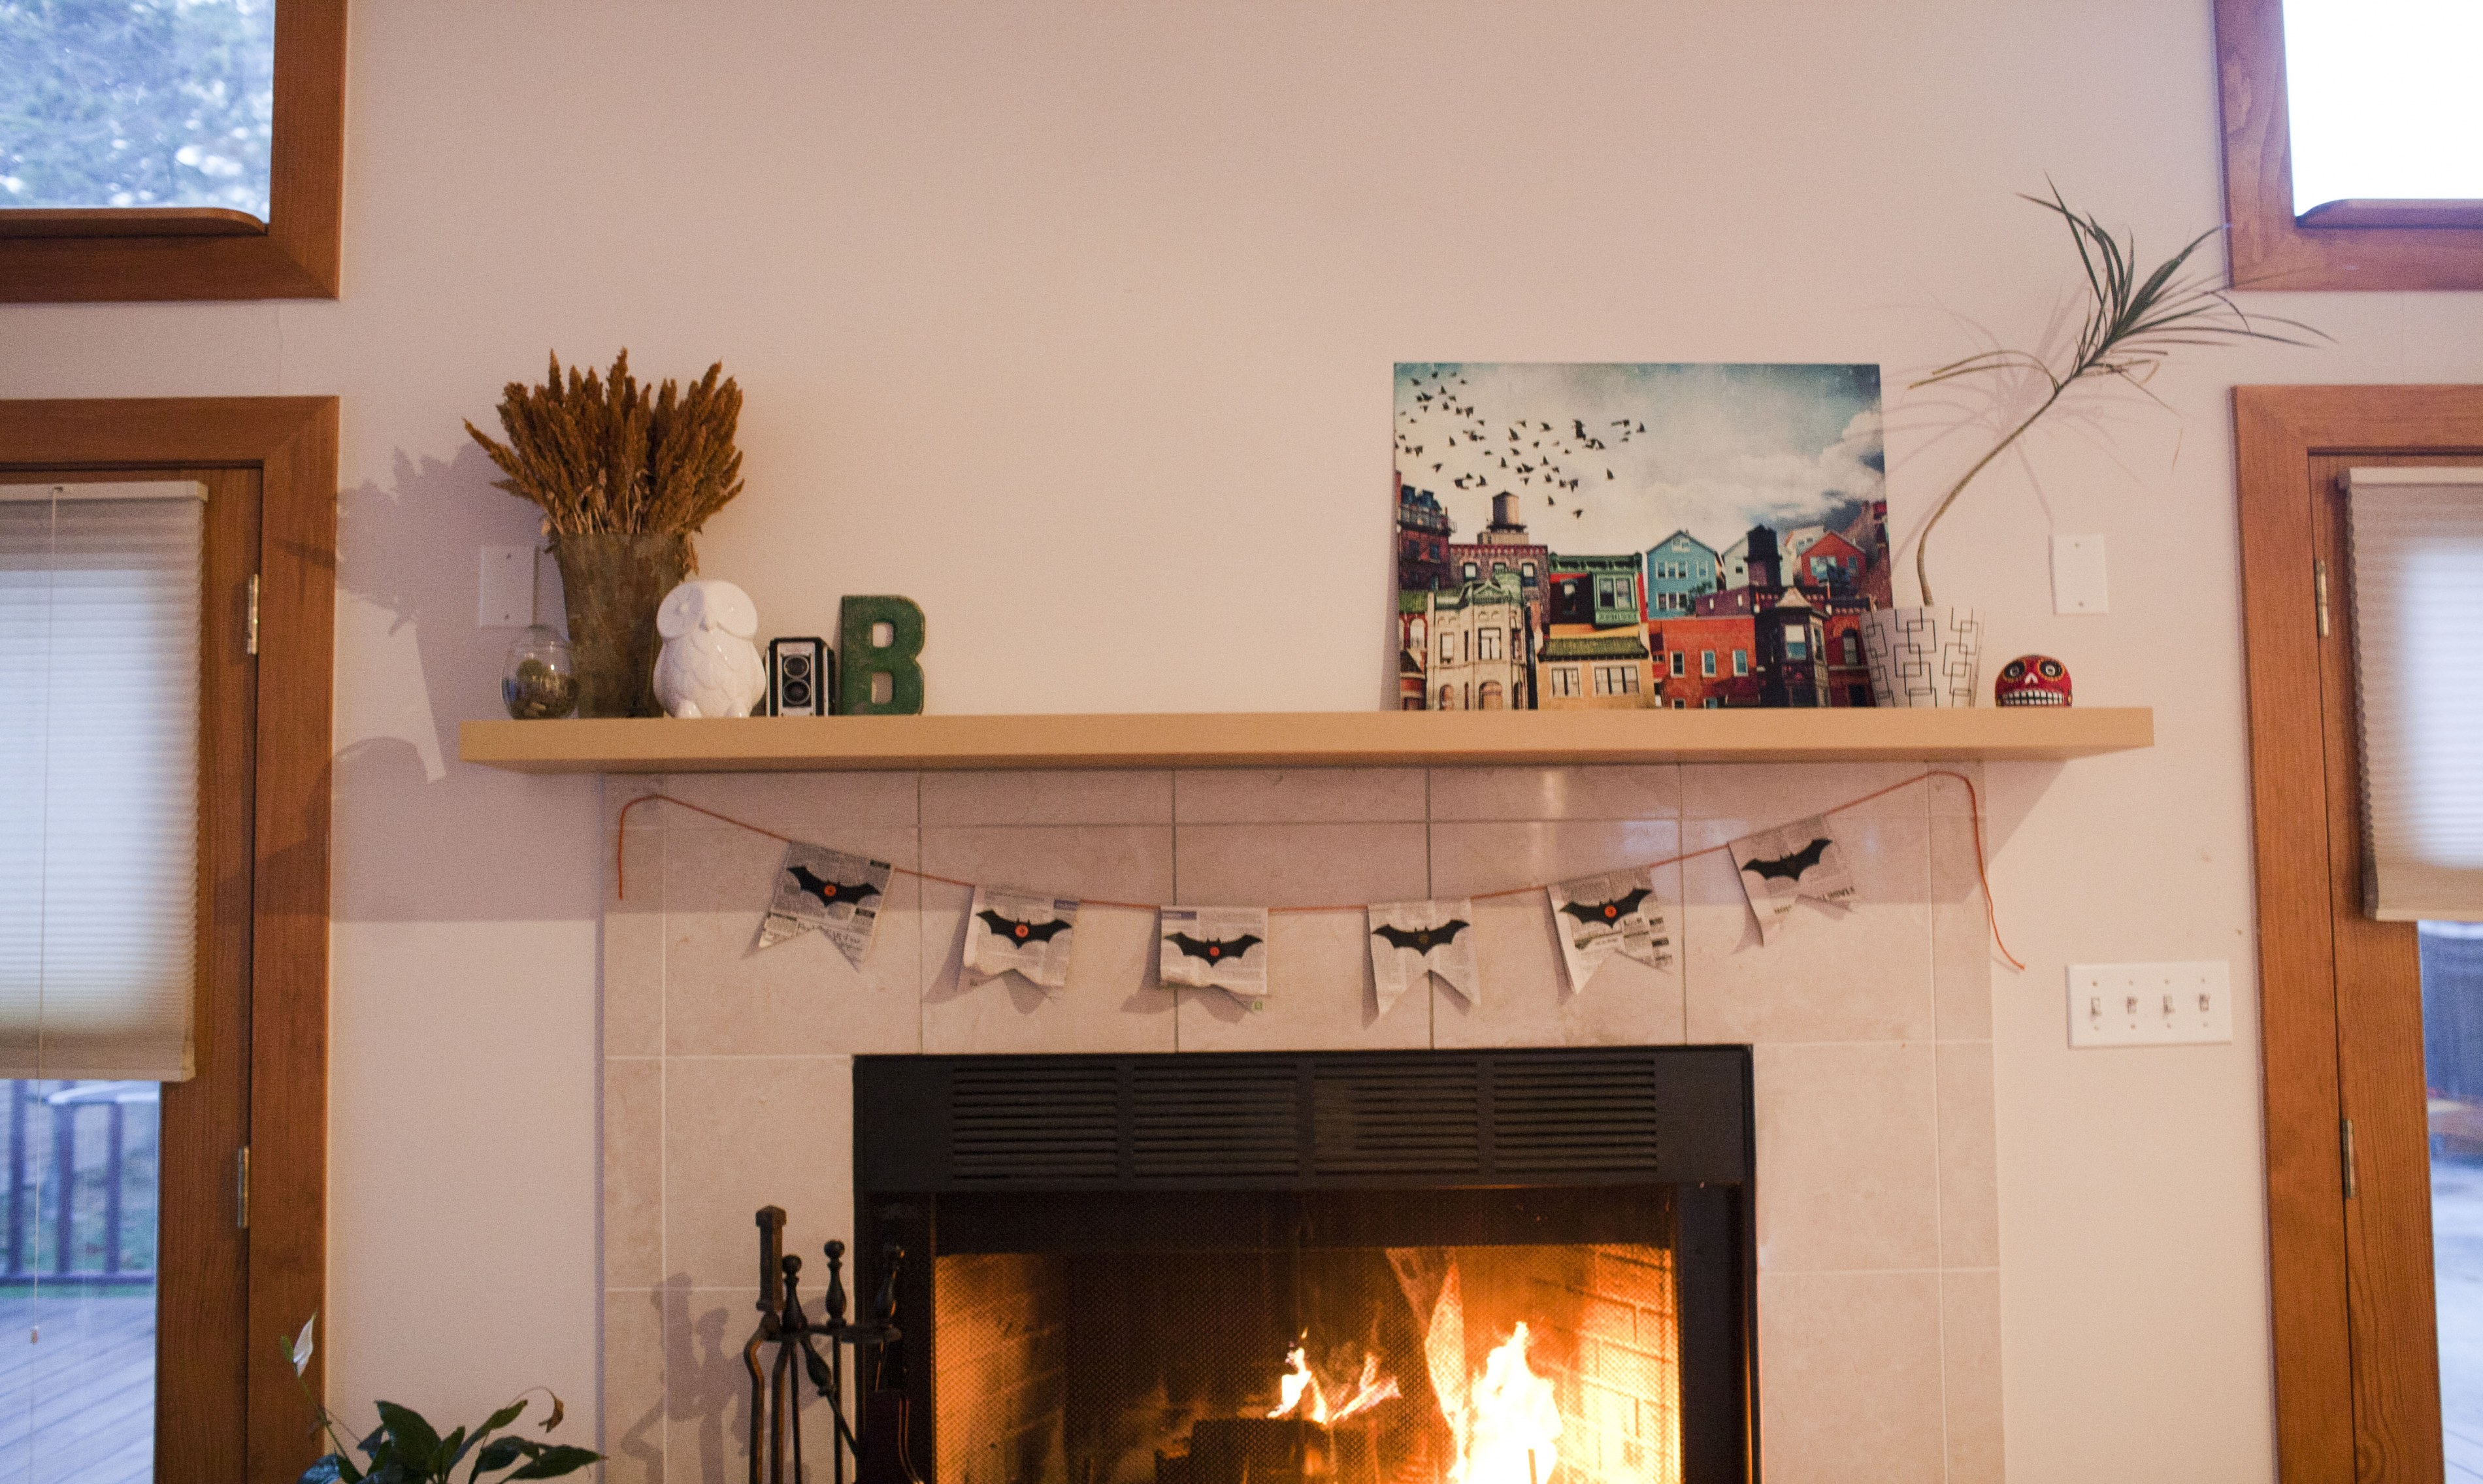 diy fireplace mantel shelf floating shelves fireplace amprh57 roc munity of diy fireplace mantel shelf